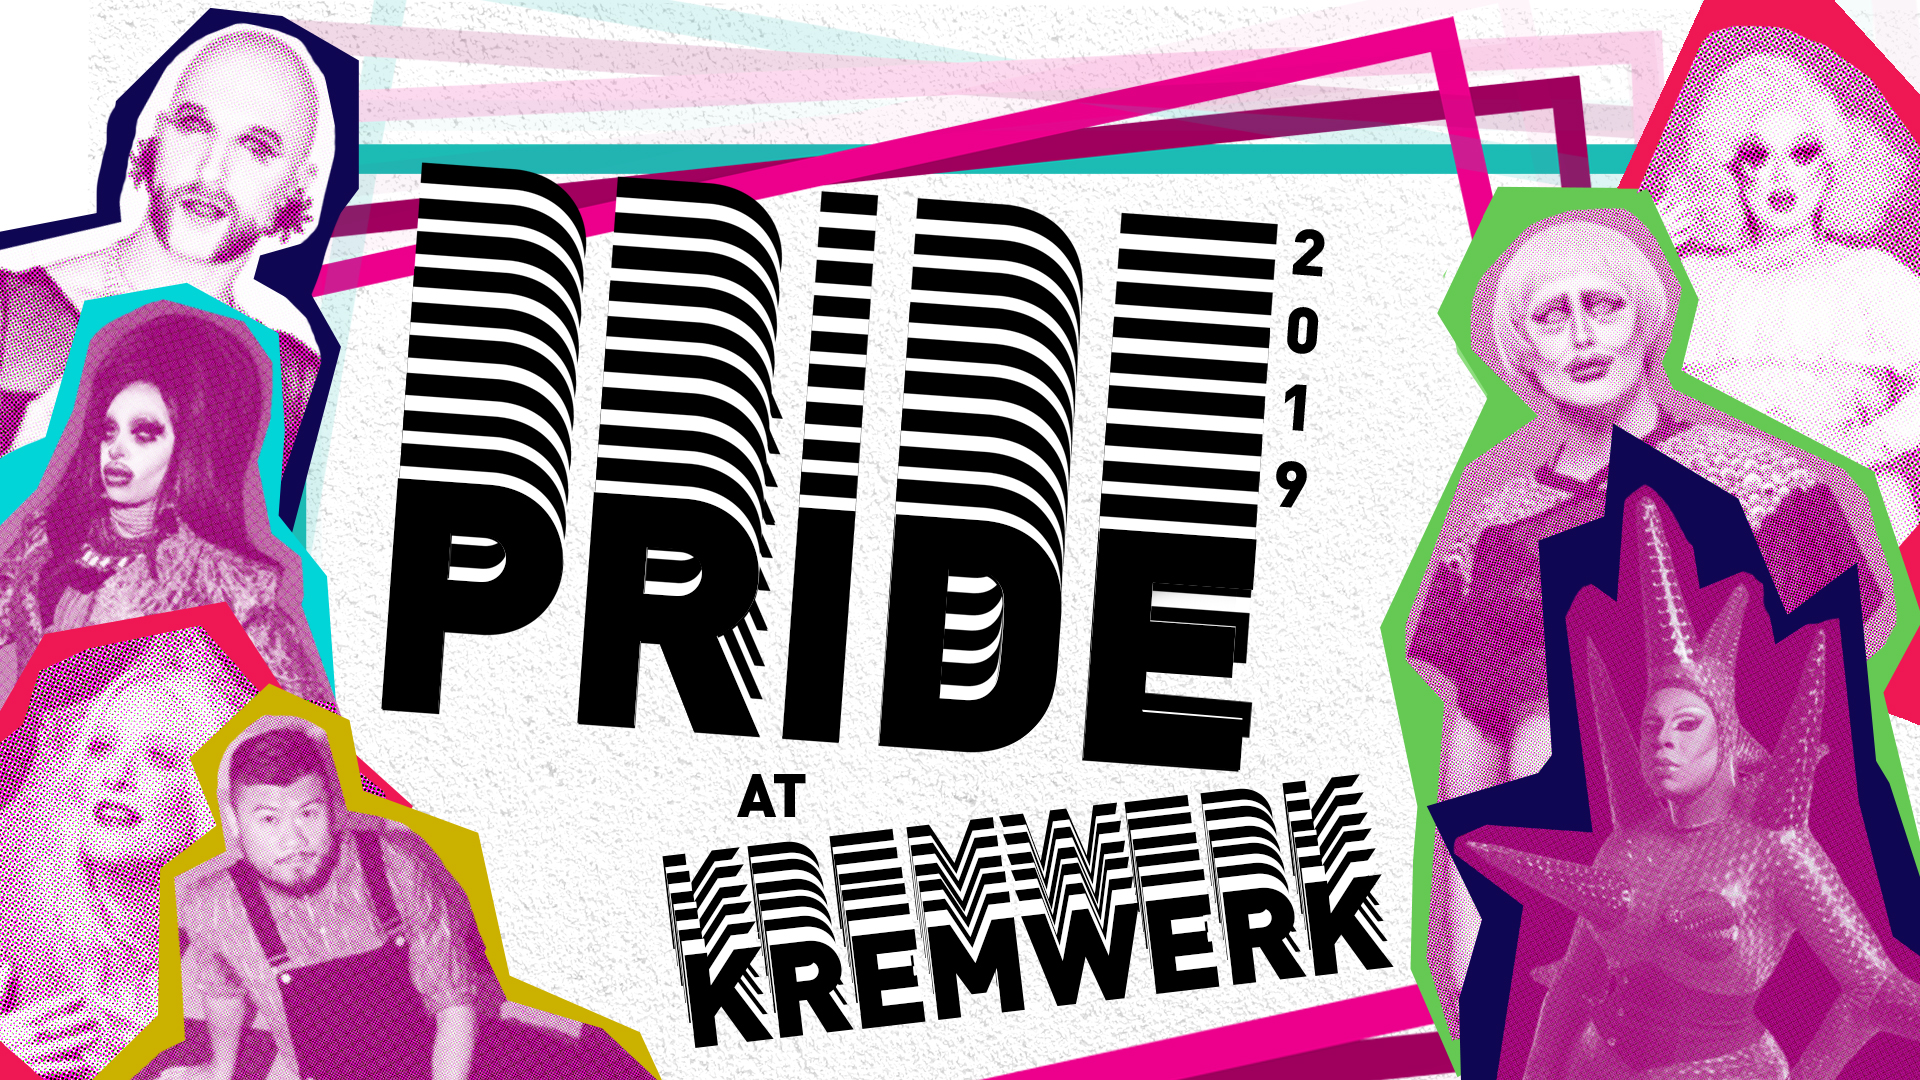 pride 2019 cover for video2.jpg